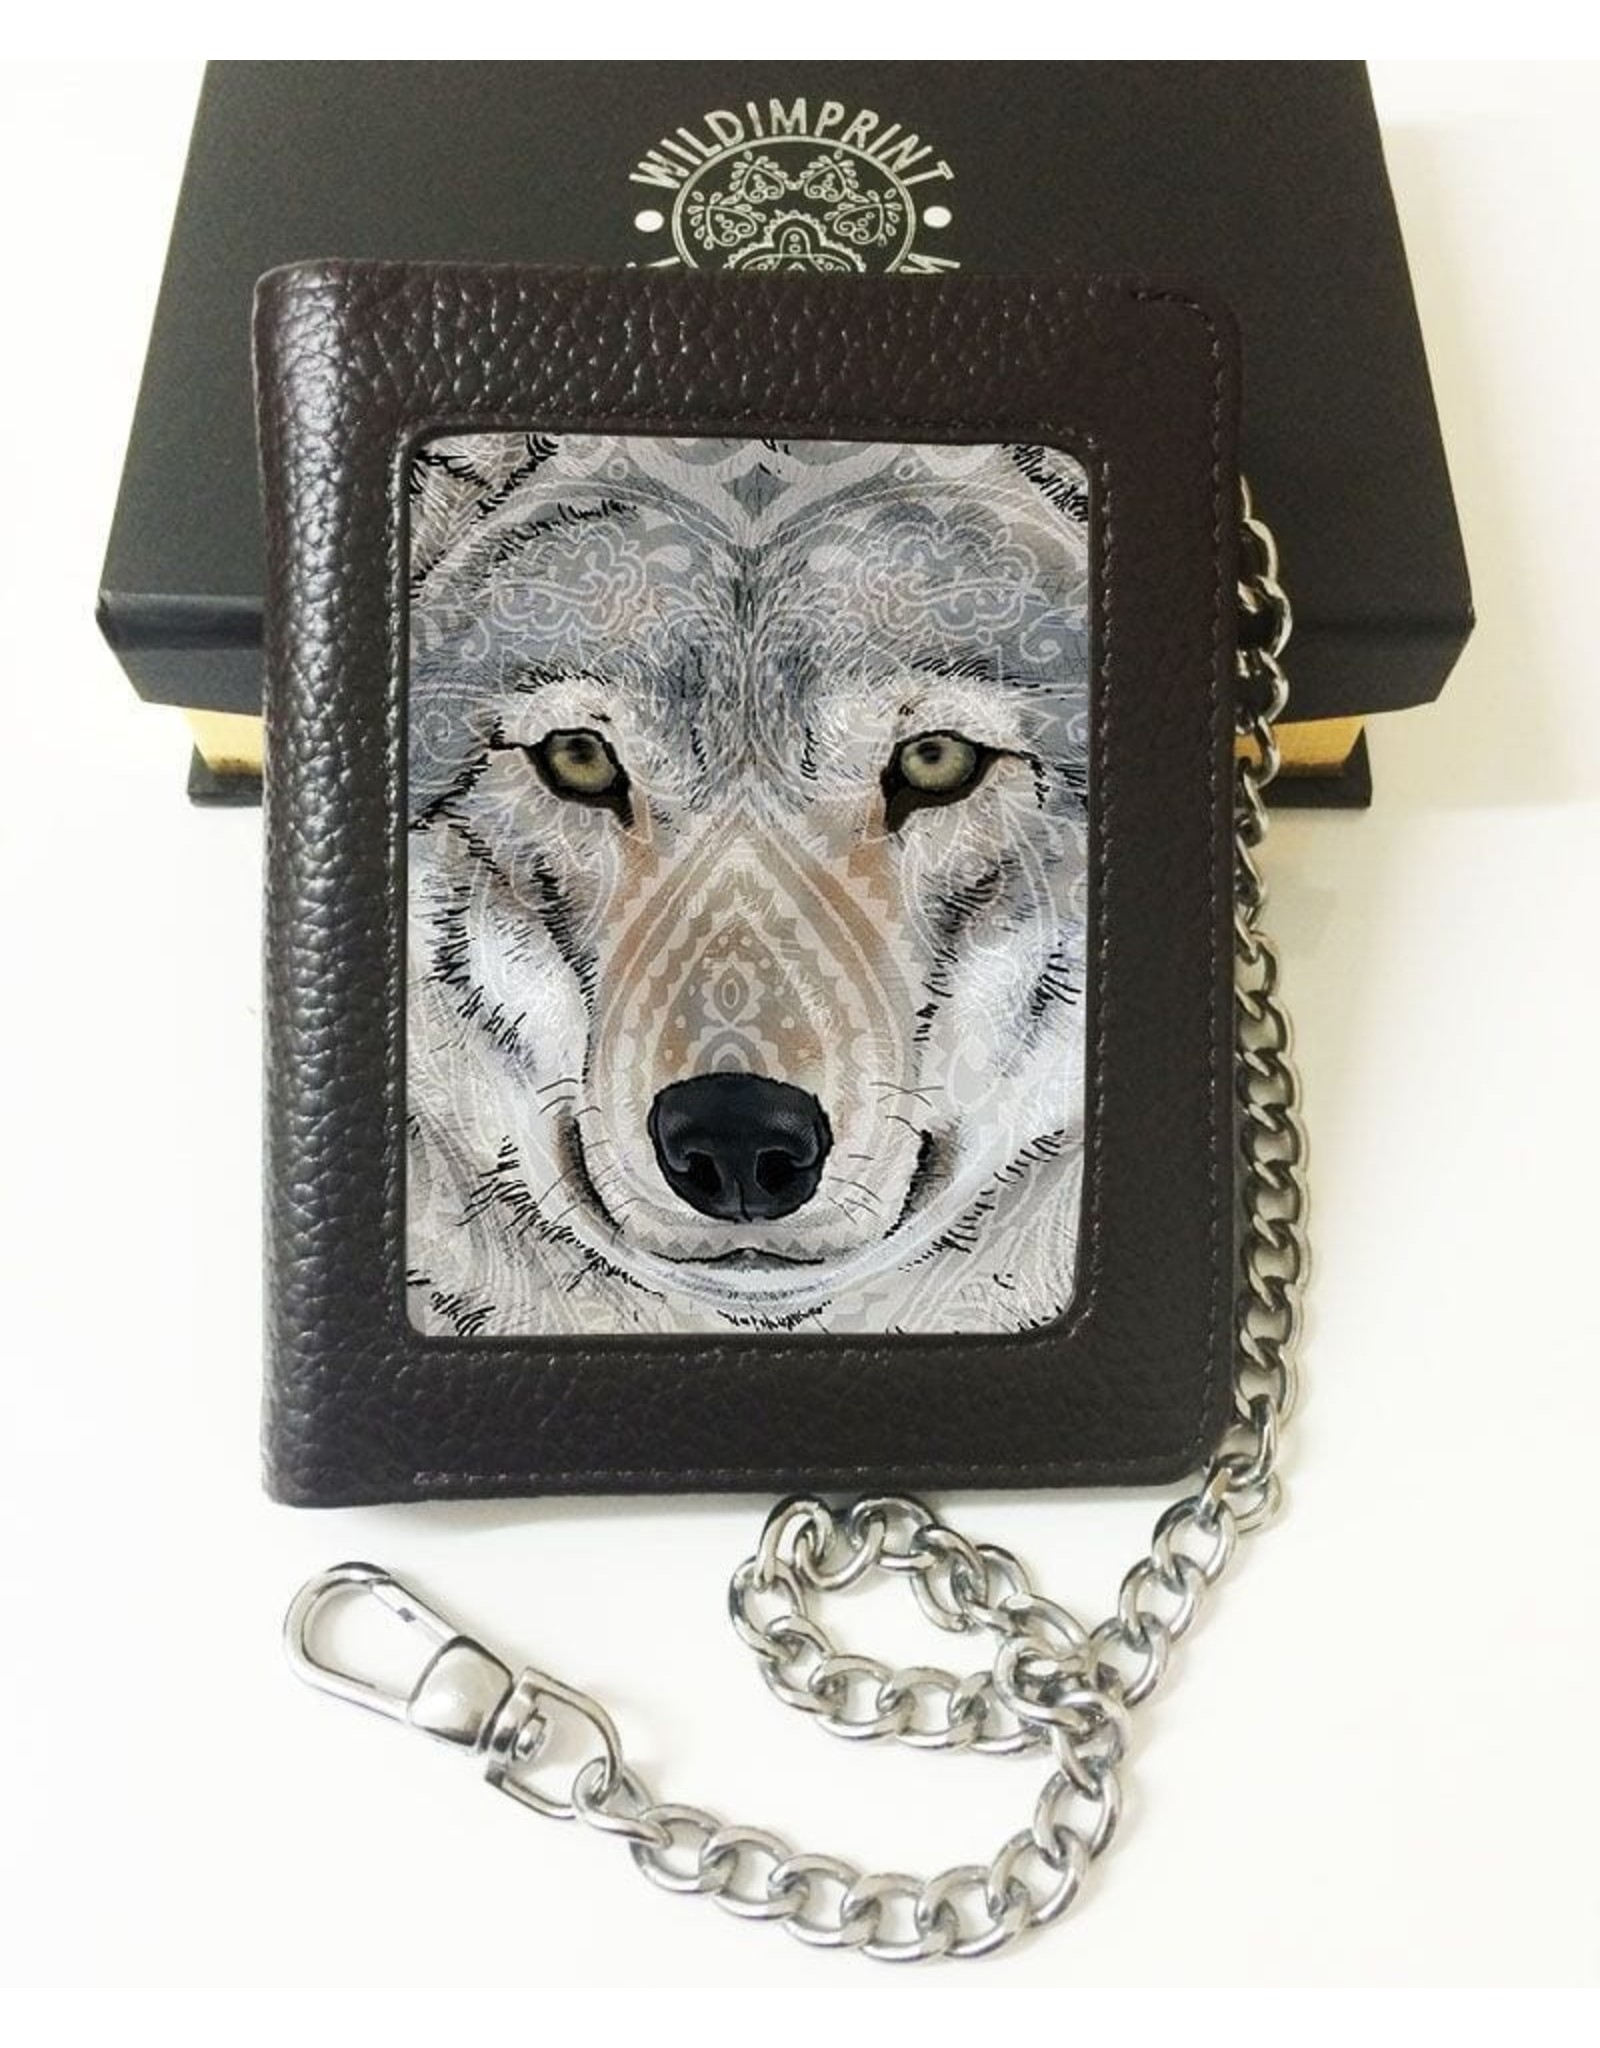 John Woodward 3D wallets - John J. Woodward 3D lenticular wallet Wolf